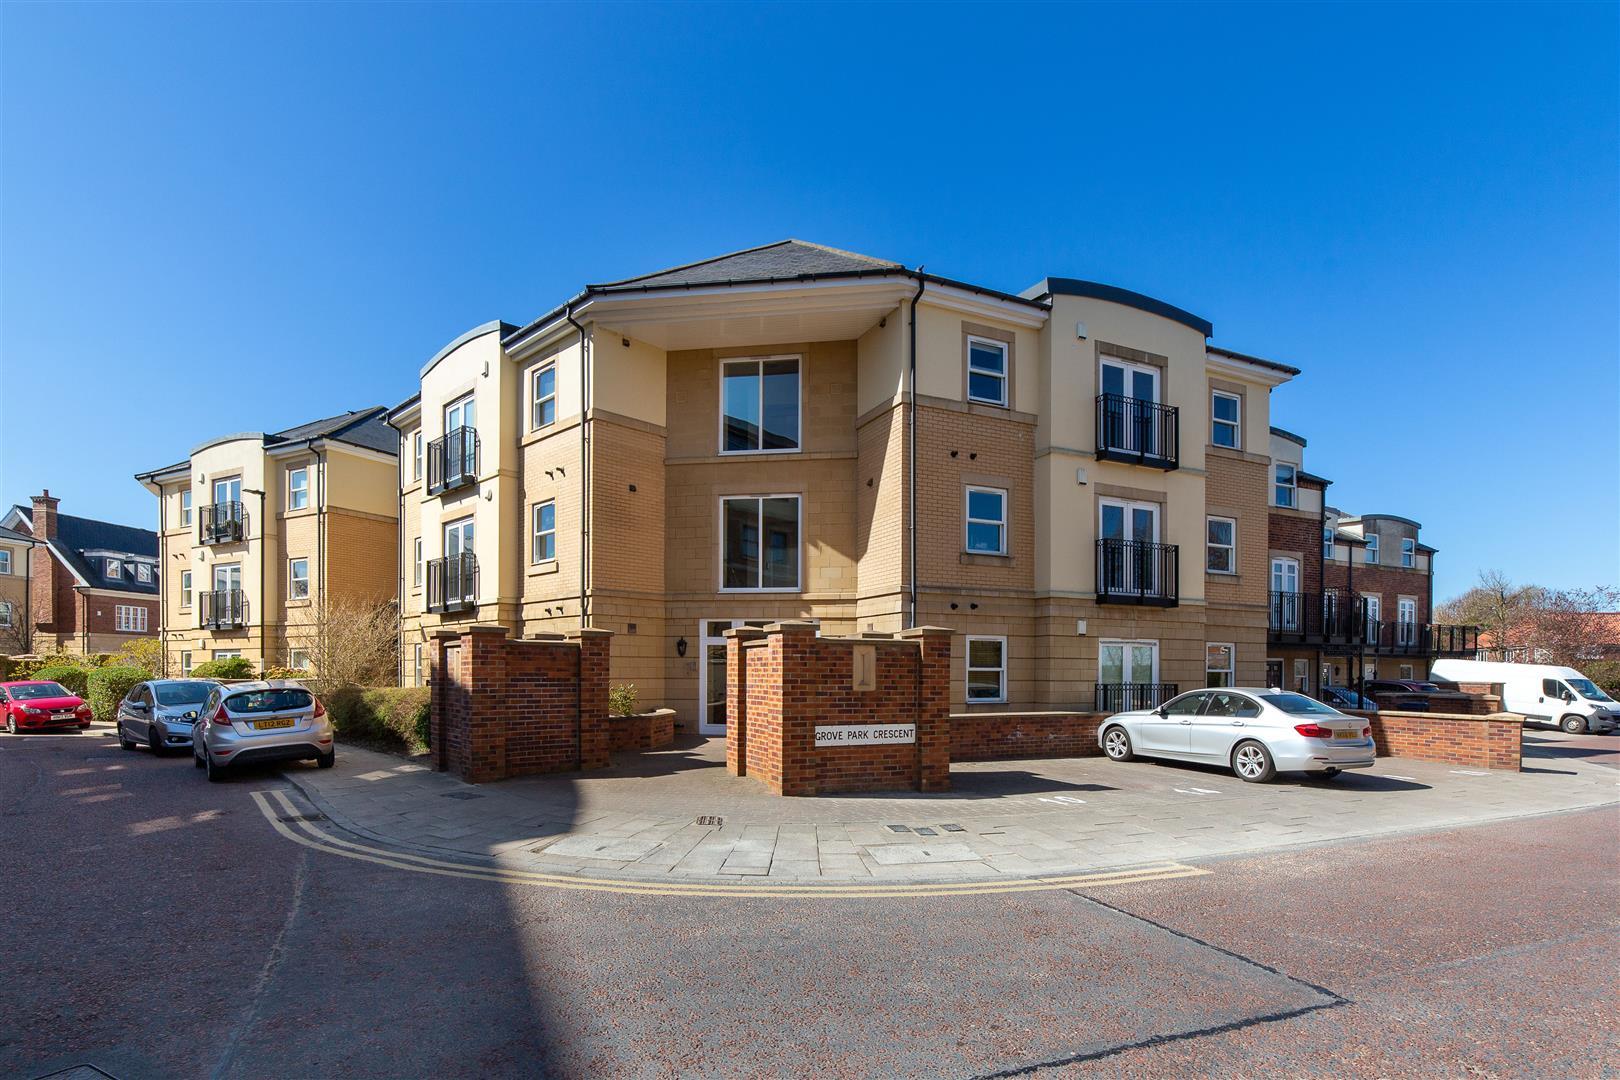 2 bed apartment for sale in Gosforth, NE3 1BP, NE3